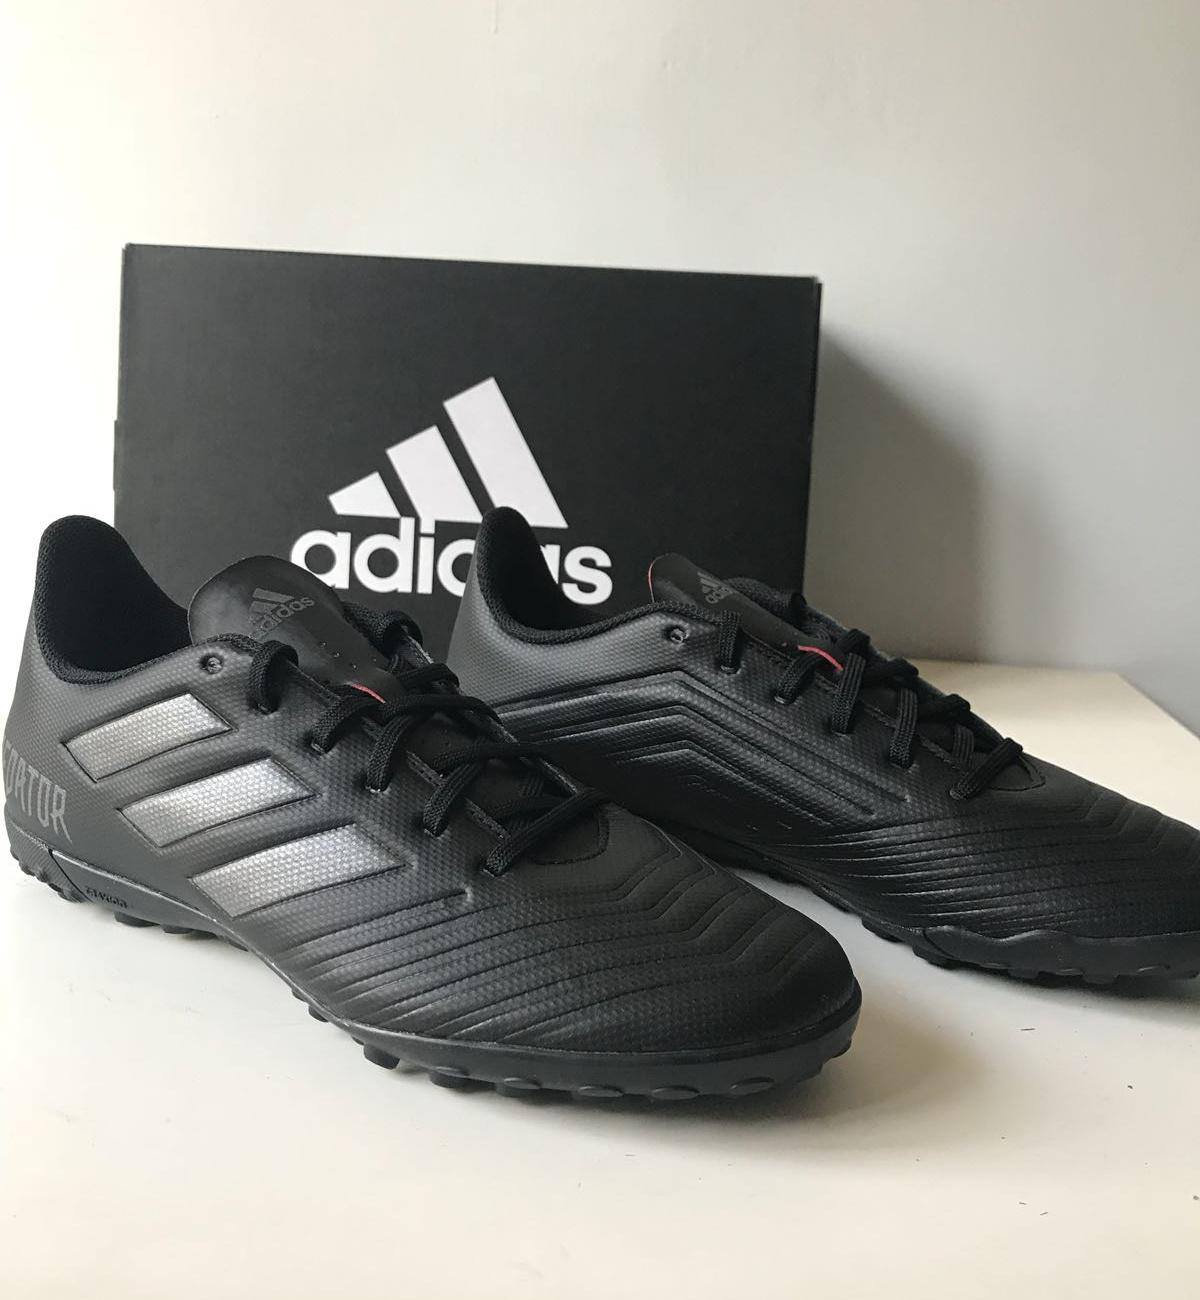 Adidas Shoes 4 A Five Tango Side Noir Predator TurfEbay 18 Football 2eWIYEH9bD